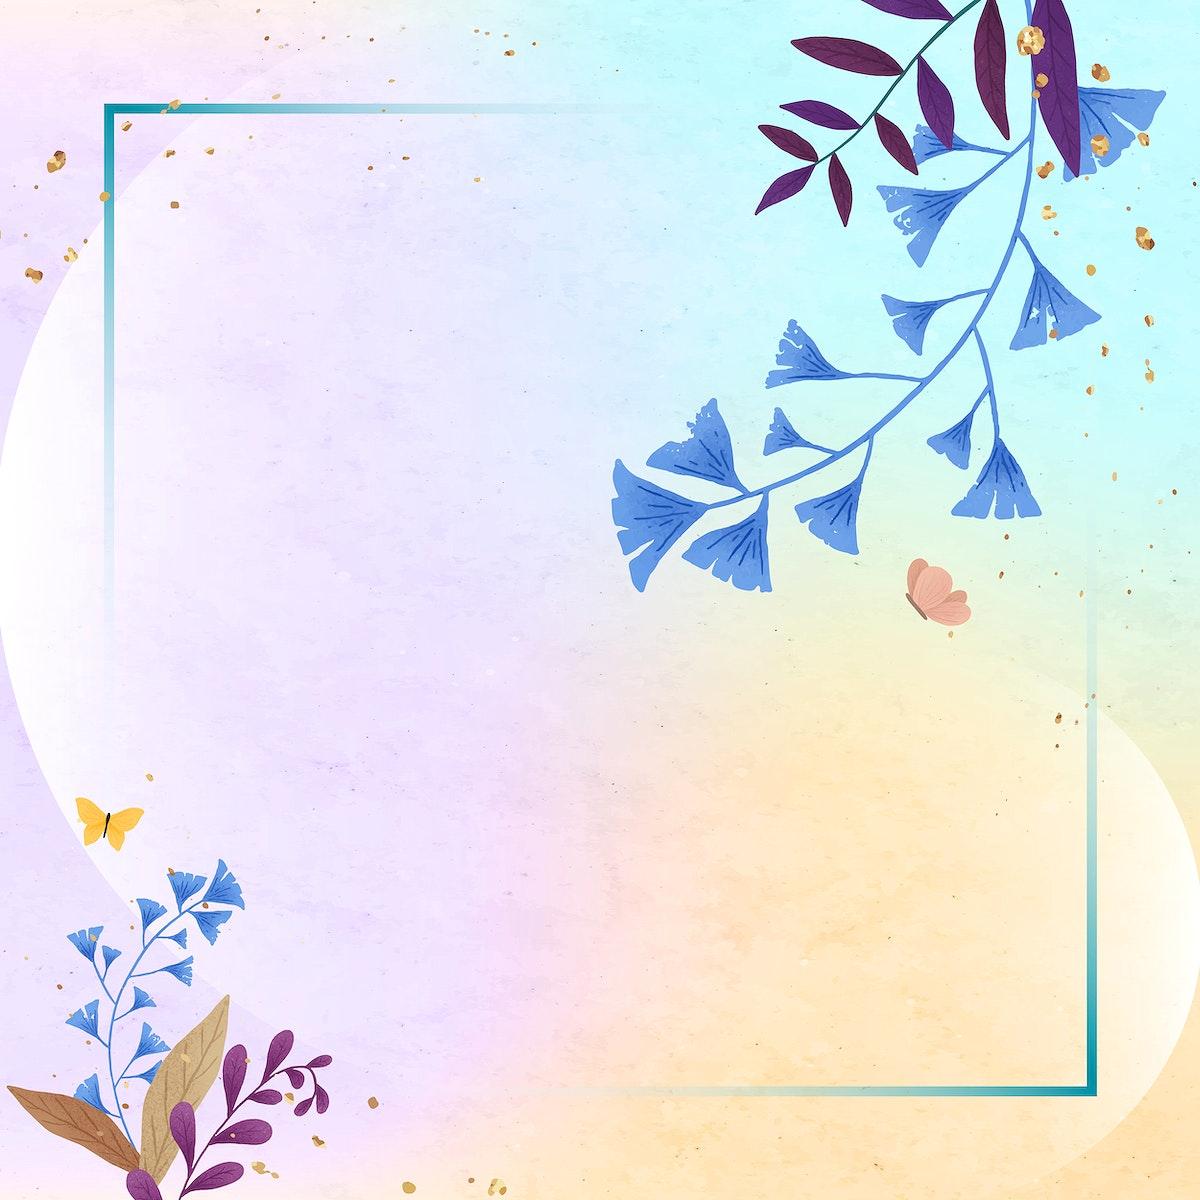 Rectangle ginkgo leaf frame vector on colorful background